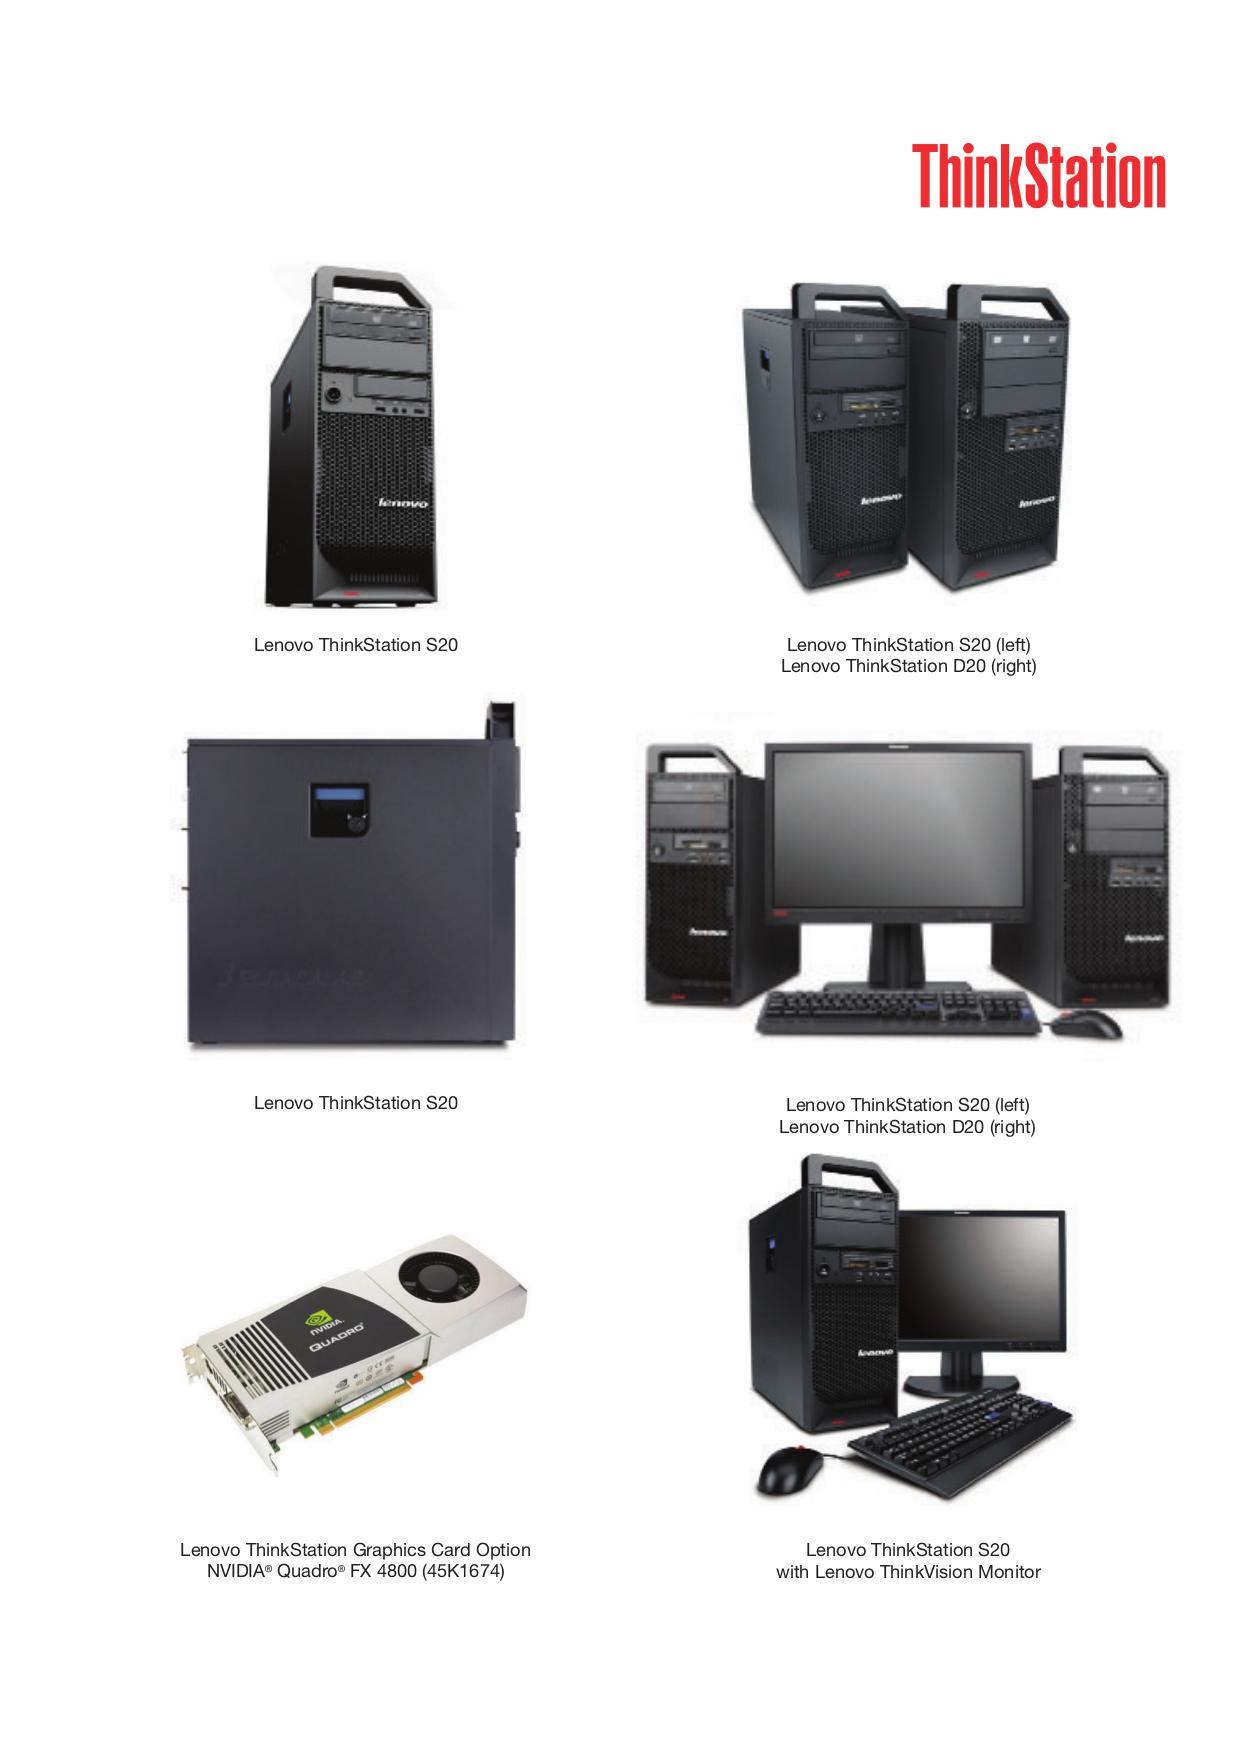 pdf for Lenovo Desktop ThinkStation S20 4105 manual